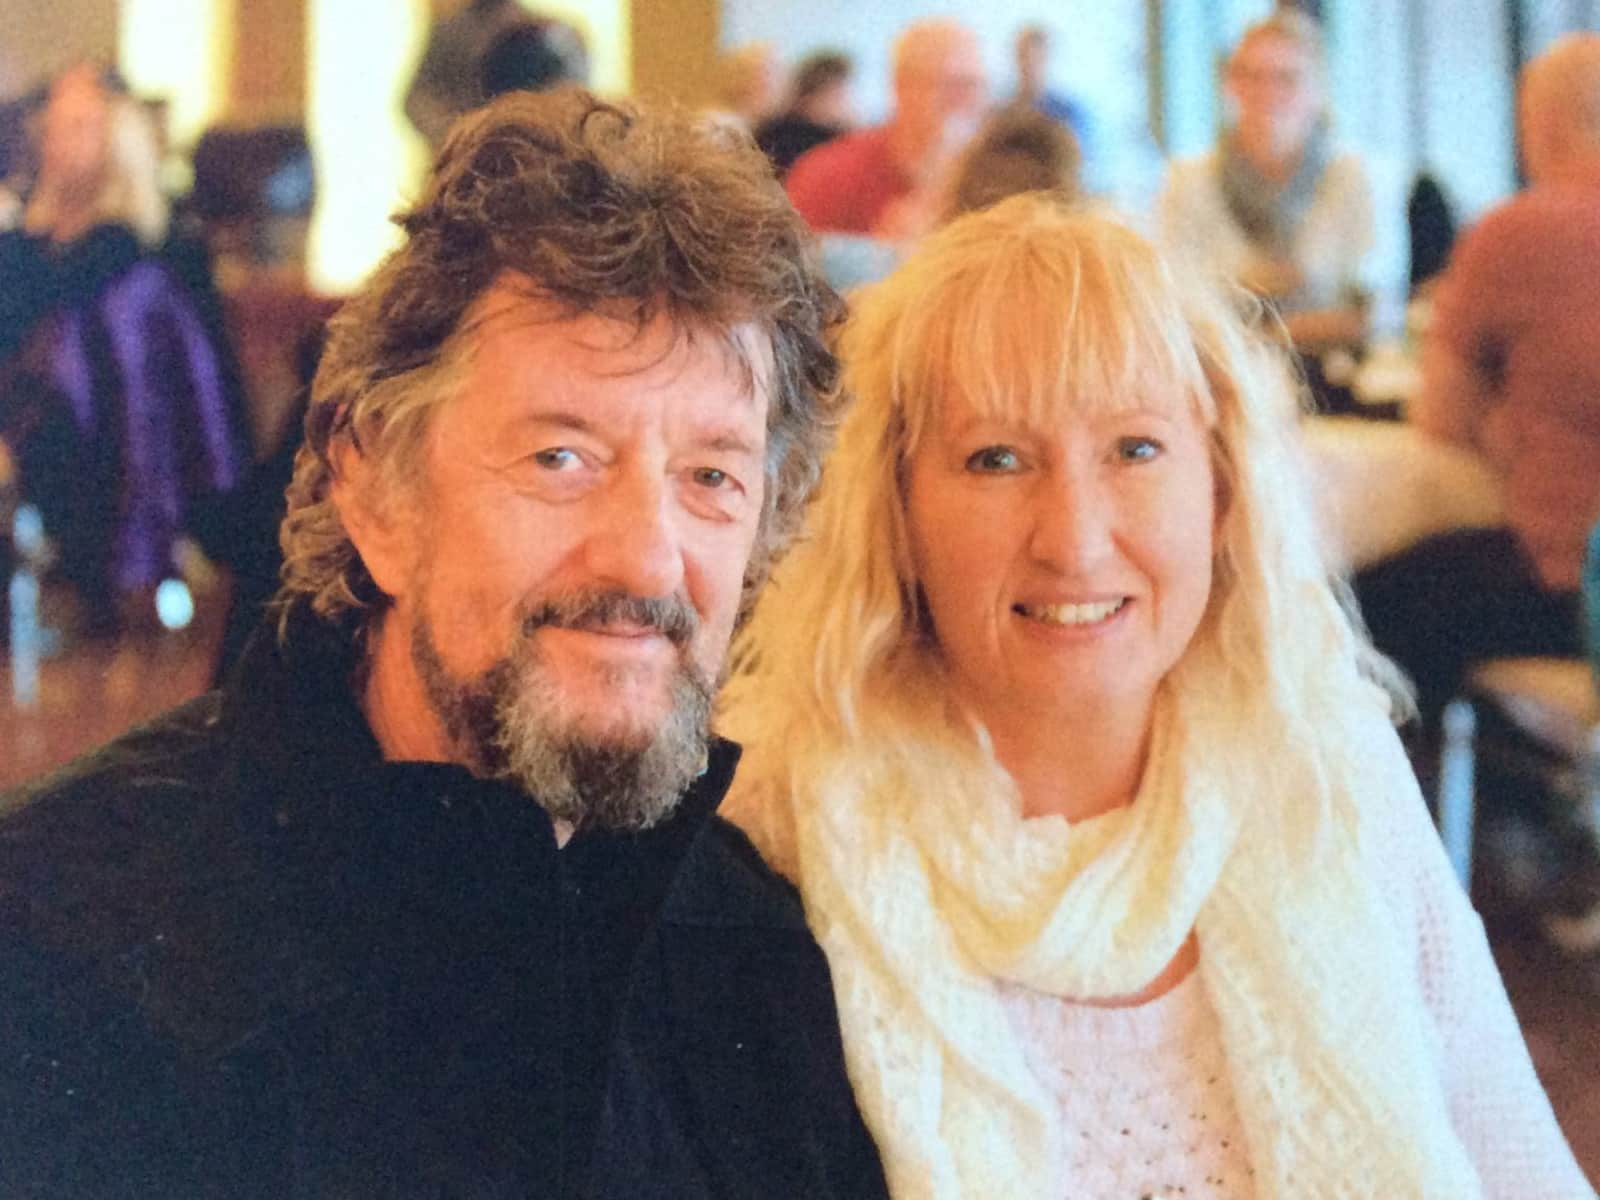 Arlene & Ross from Gold Coast, Queensland, Australia